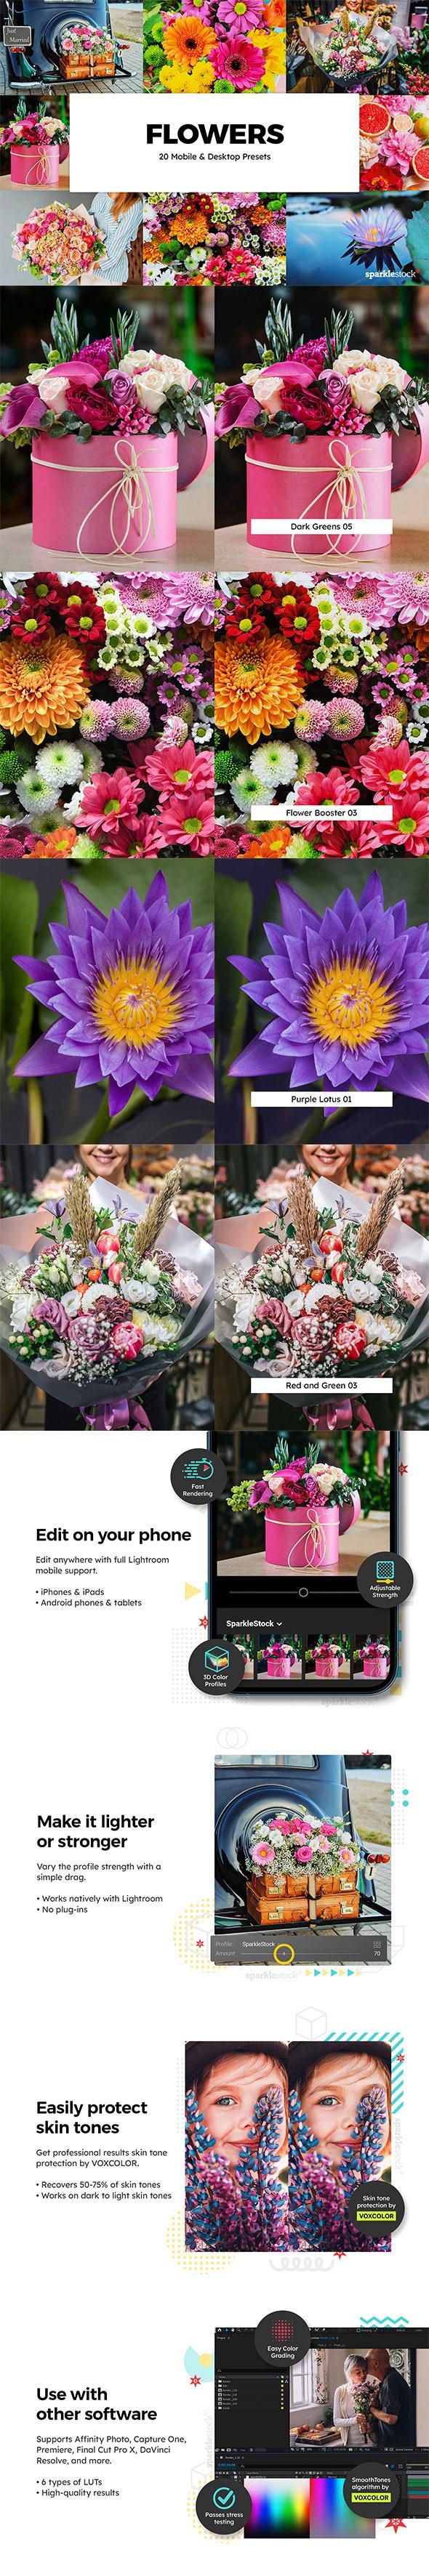 20 Flowers Lightroom Presets & LUTs - Lightroom Presets Add-ons